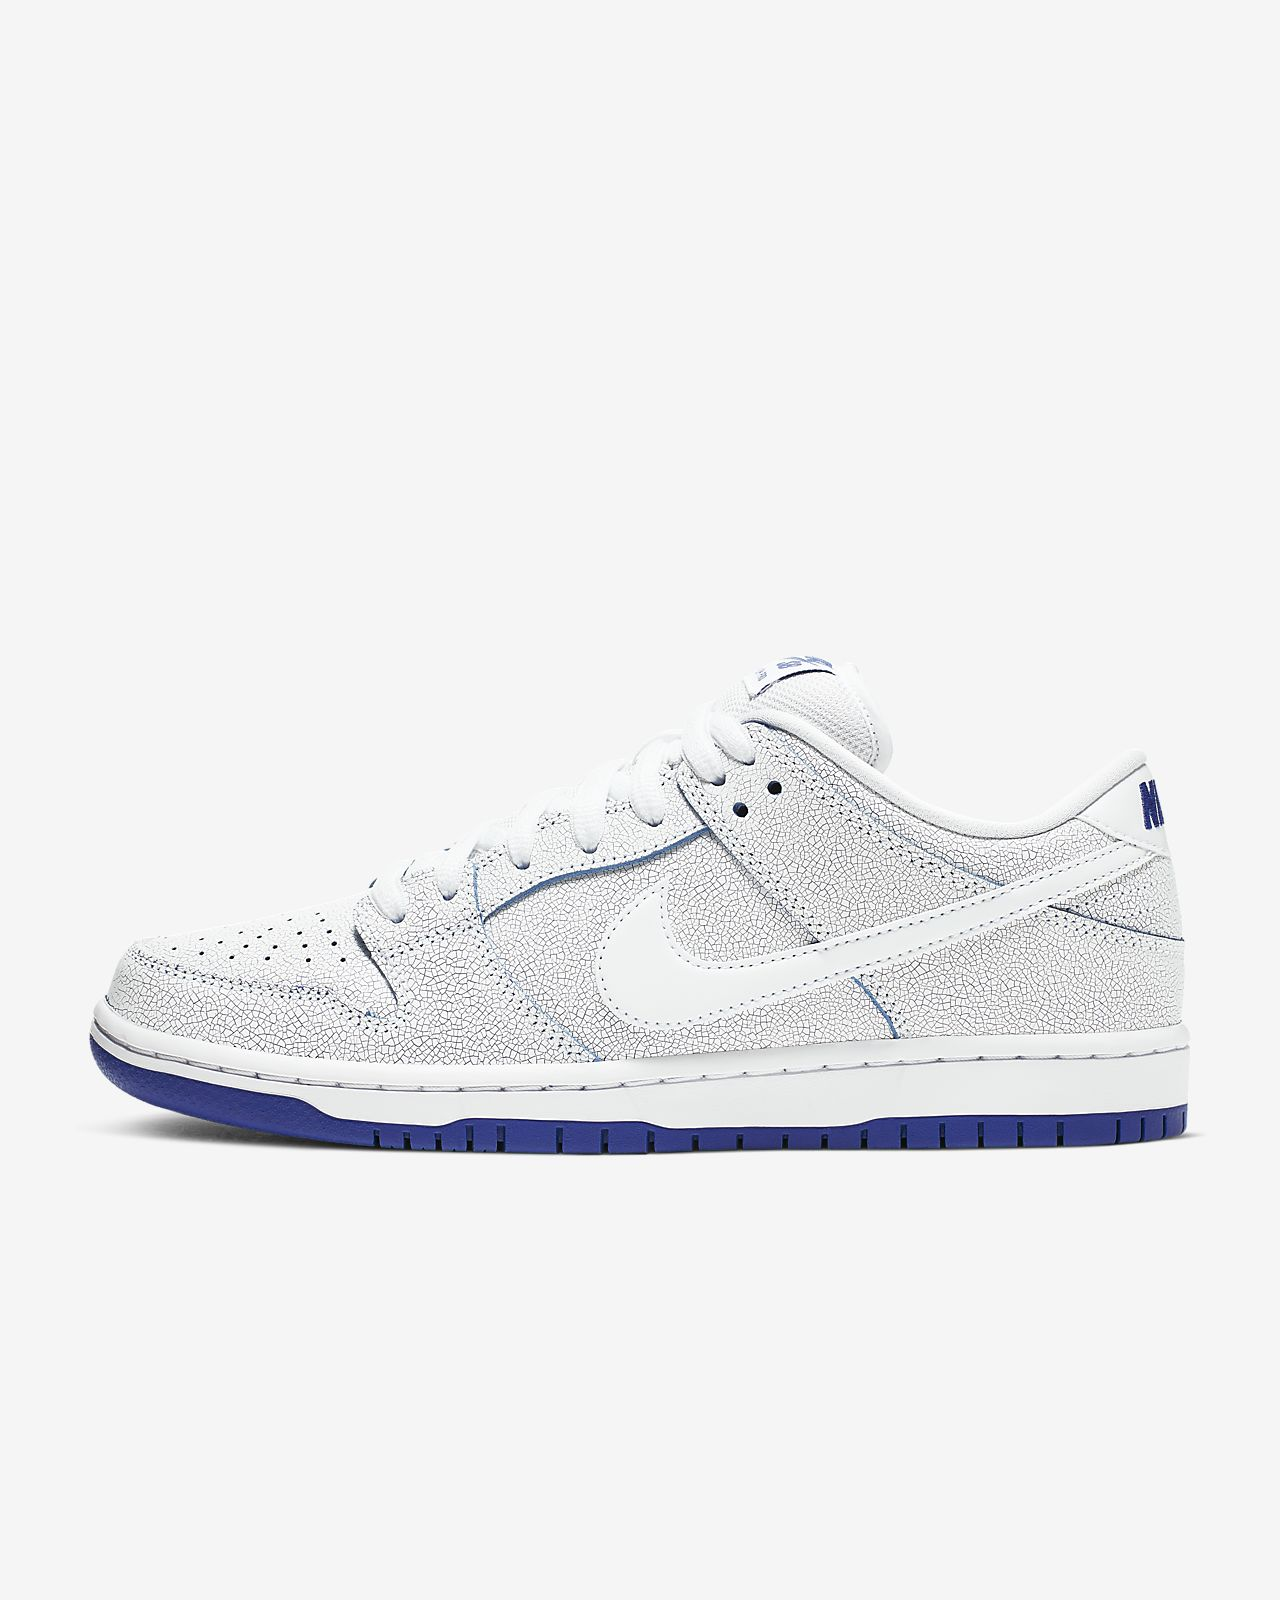 buy online f7aaf 4174b Nike SB Dunk Low Pro Premium Skate Shoe